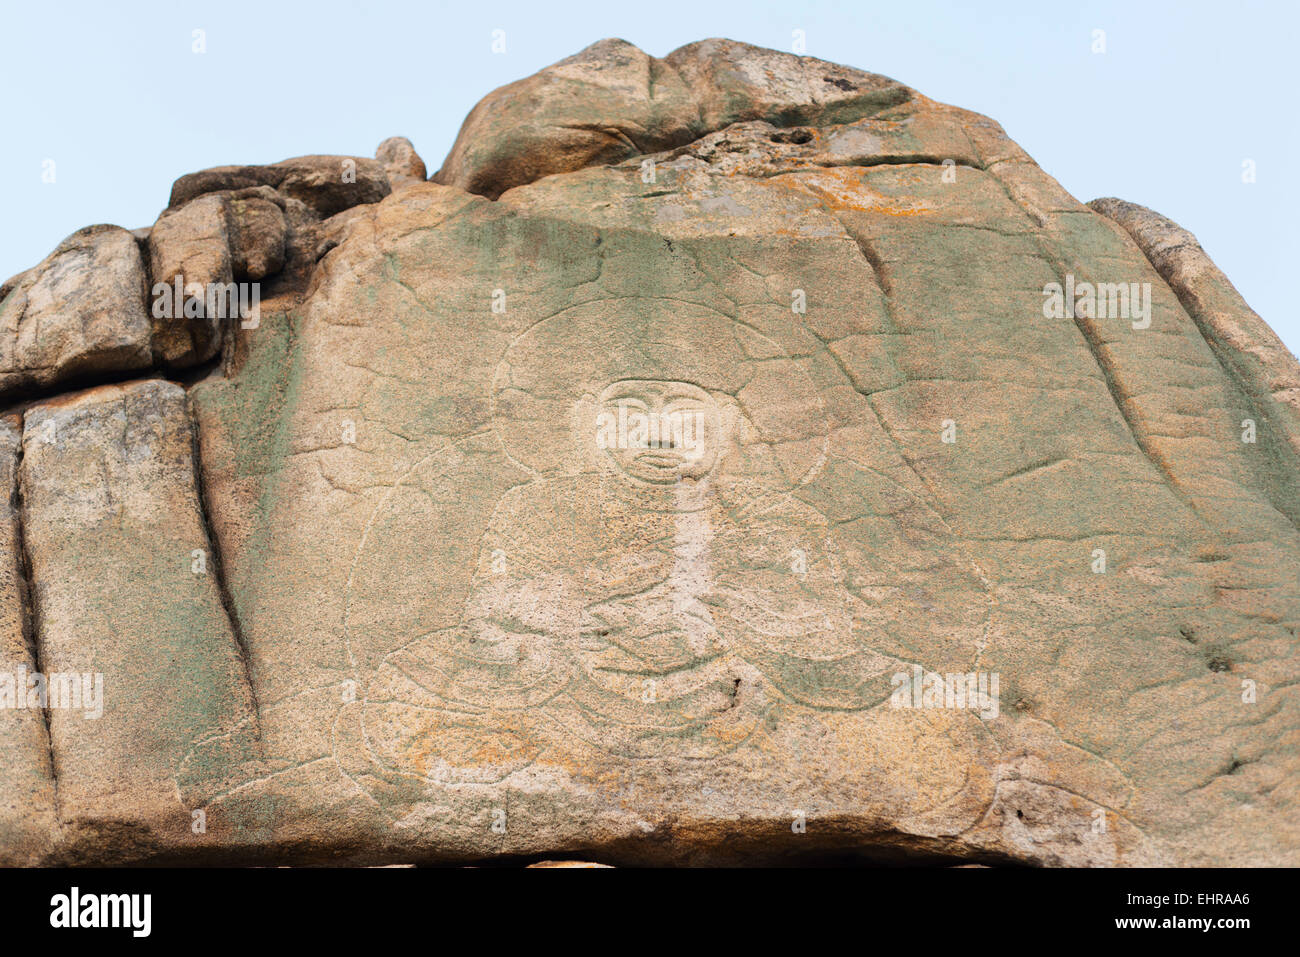 Asia, Republic of Korea, South Korea, Gyeongsangbuk-do, Gyeongju, Mt Namsan National Park, rock carved buddha image, - Stock Image